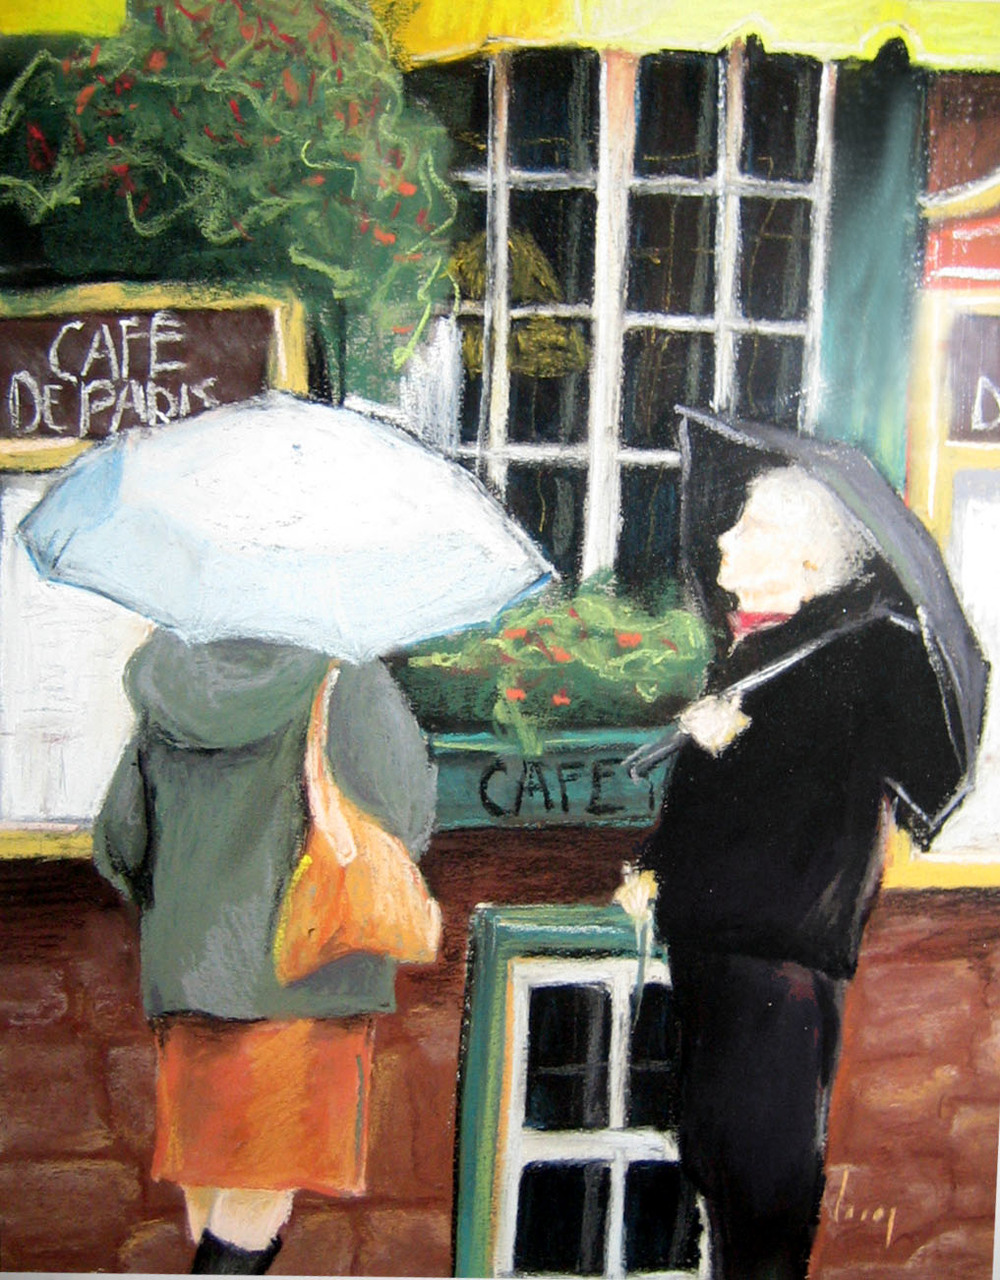 Cafe De Paris, 2006